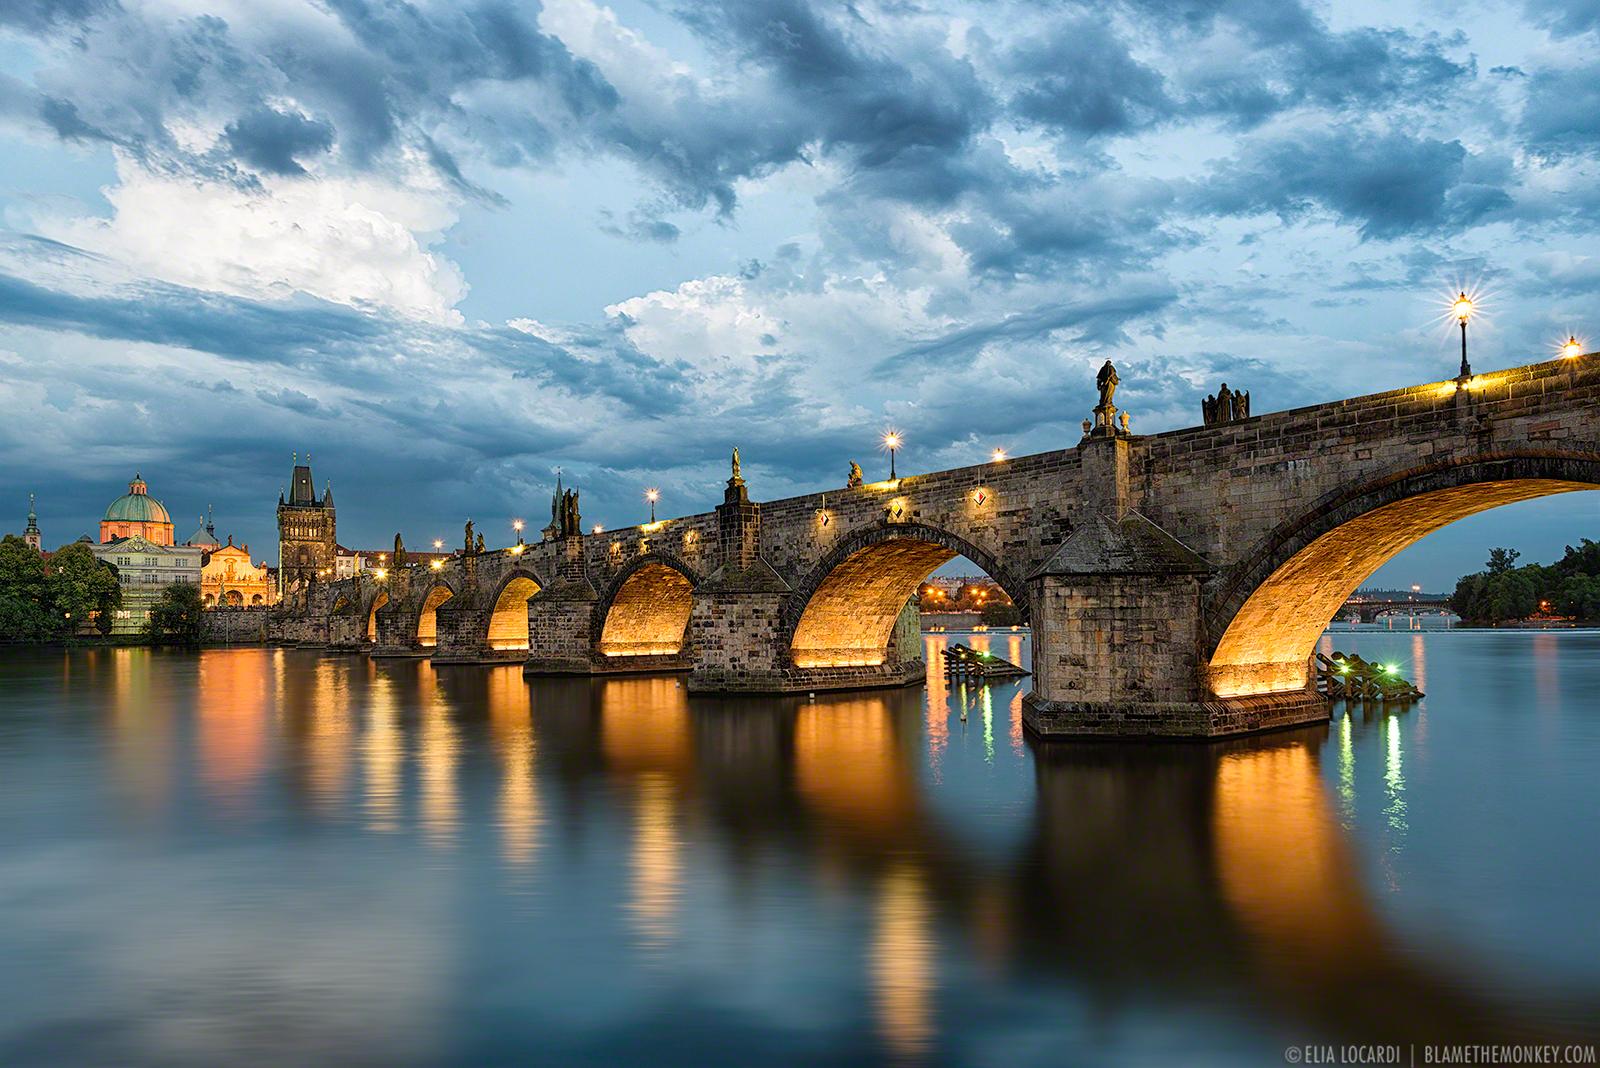 Elia-Locardi-Travel-Photography-Bohemian-Sky-Prague-Czech-Republic-1600-WM-DM.jpg